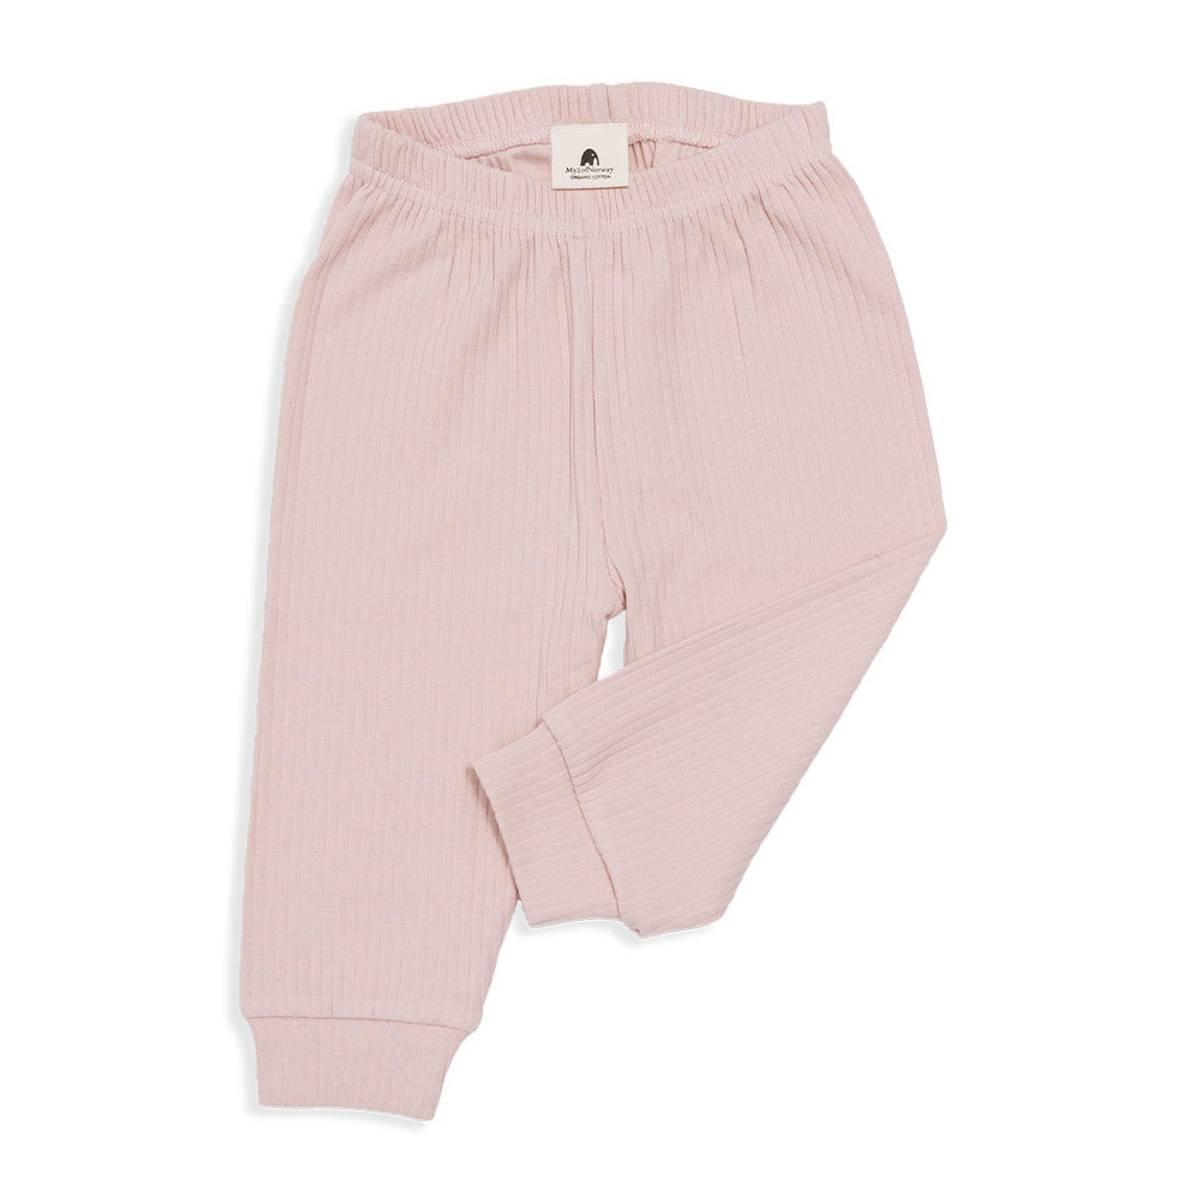 My1 Comfy - Powder pink